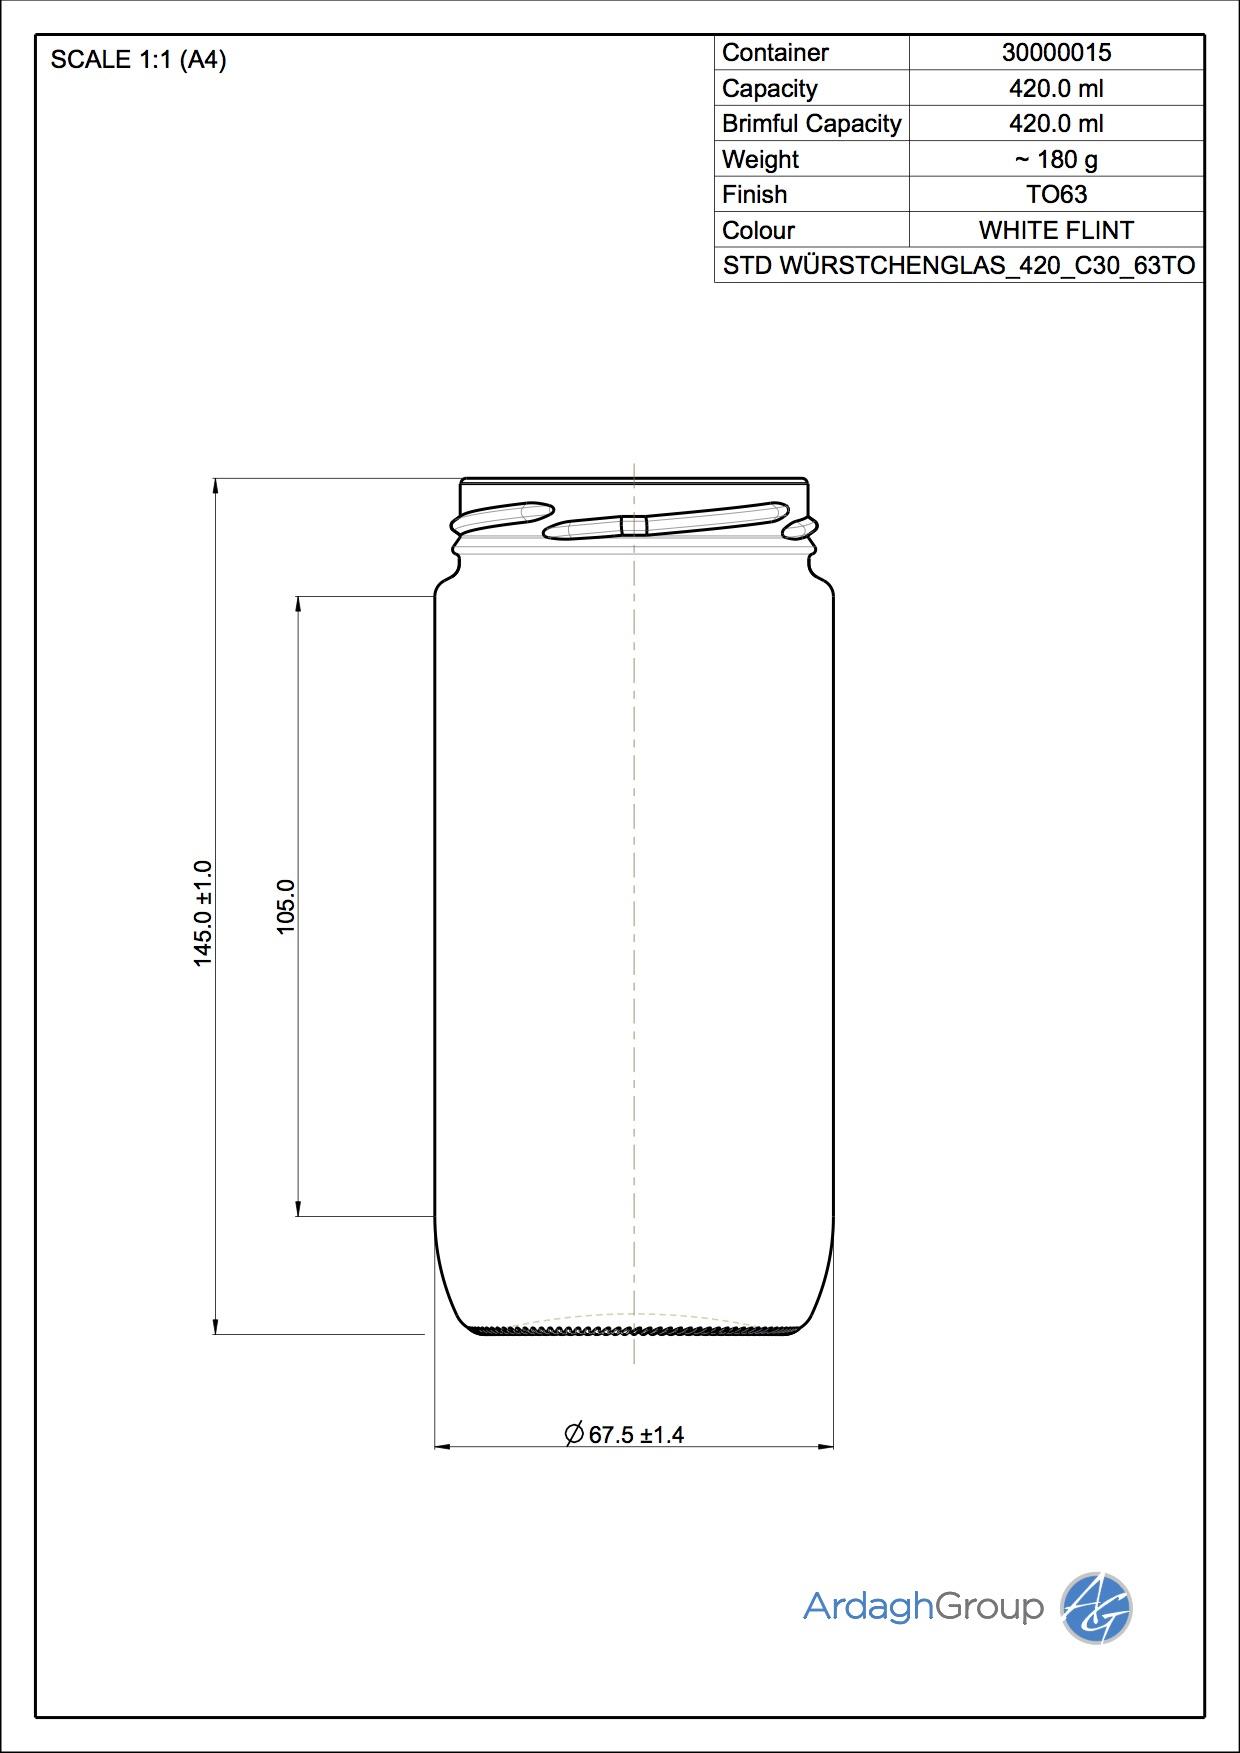 Wuerstchenglas 420 C30 63TO